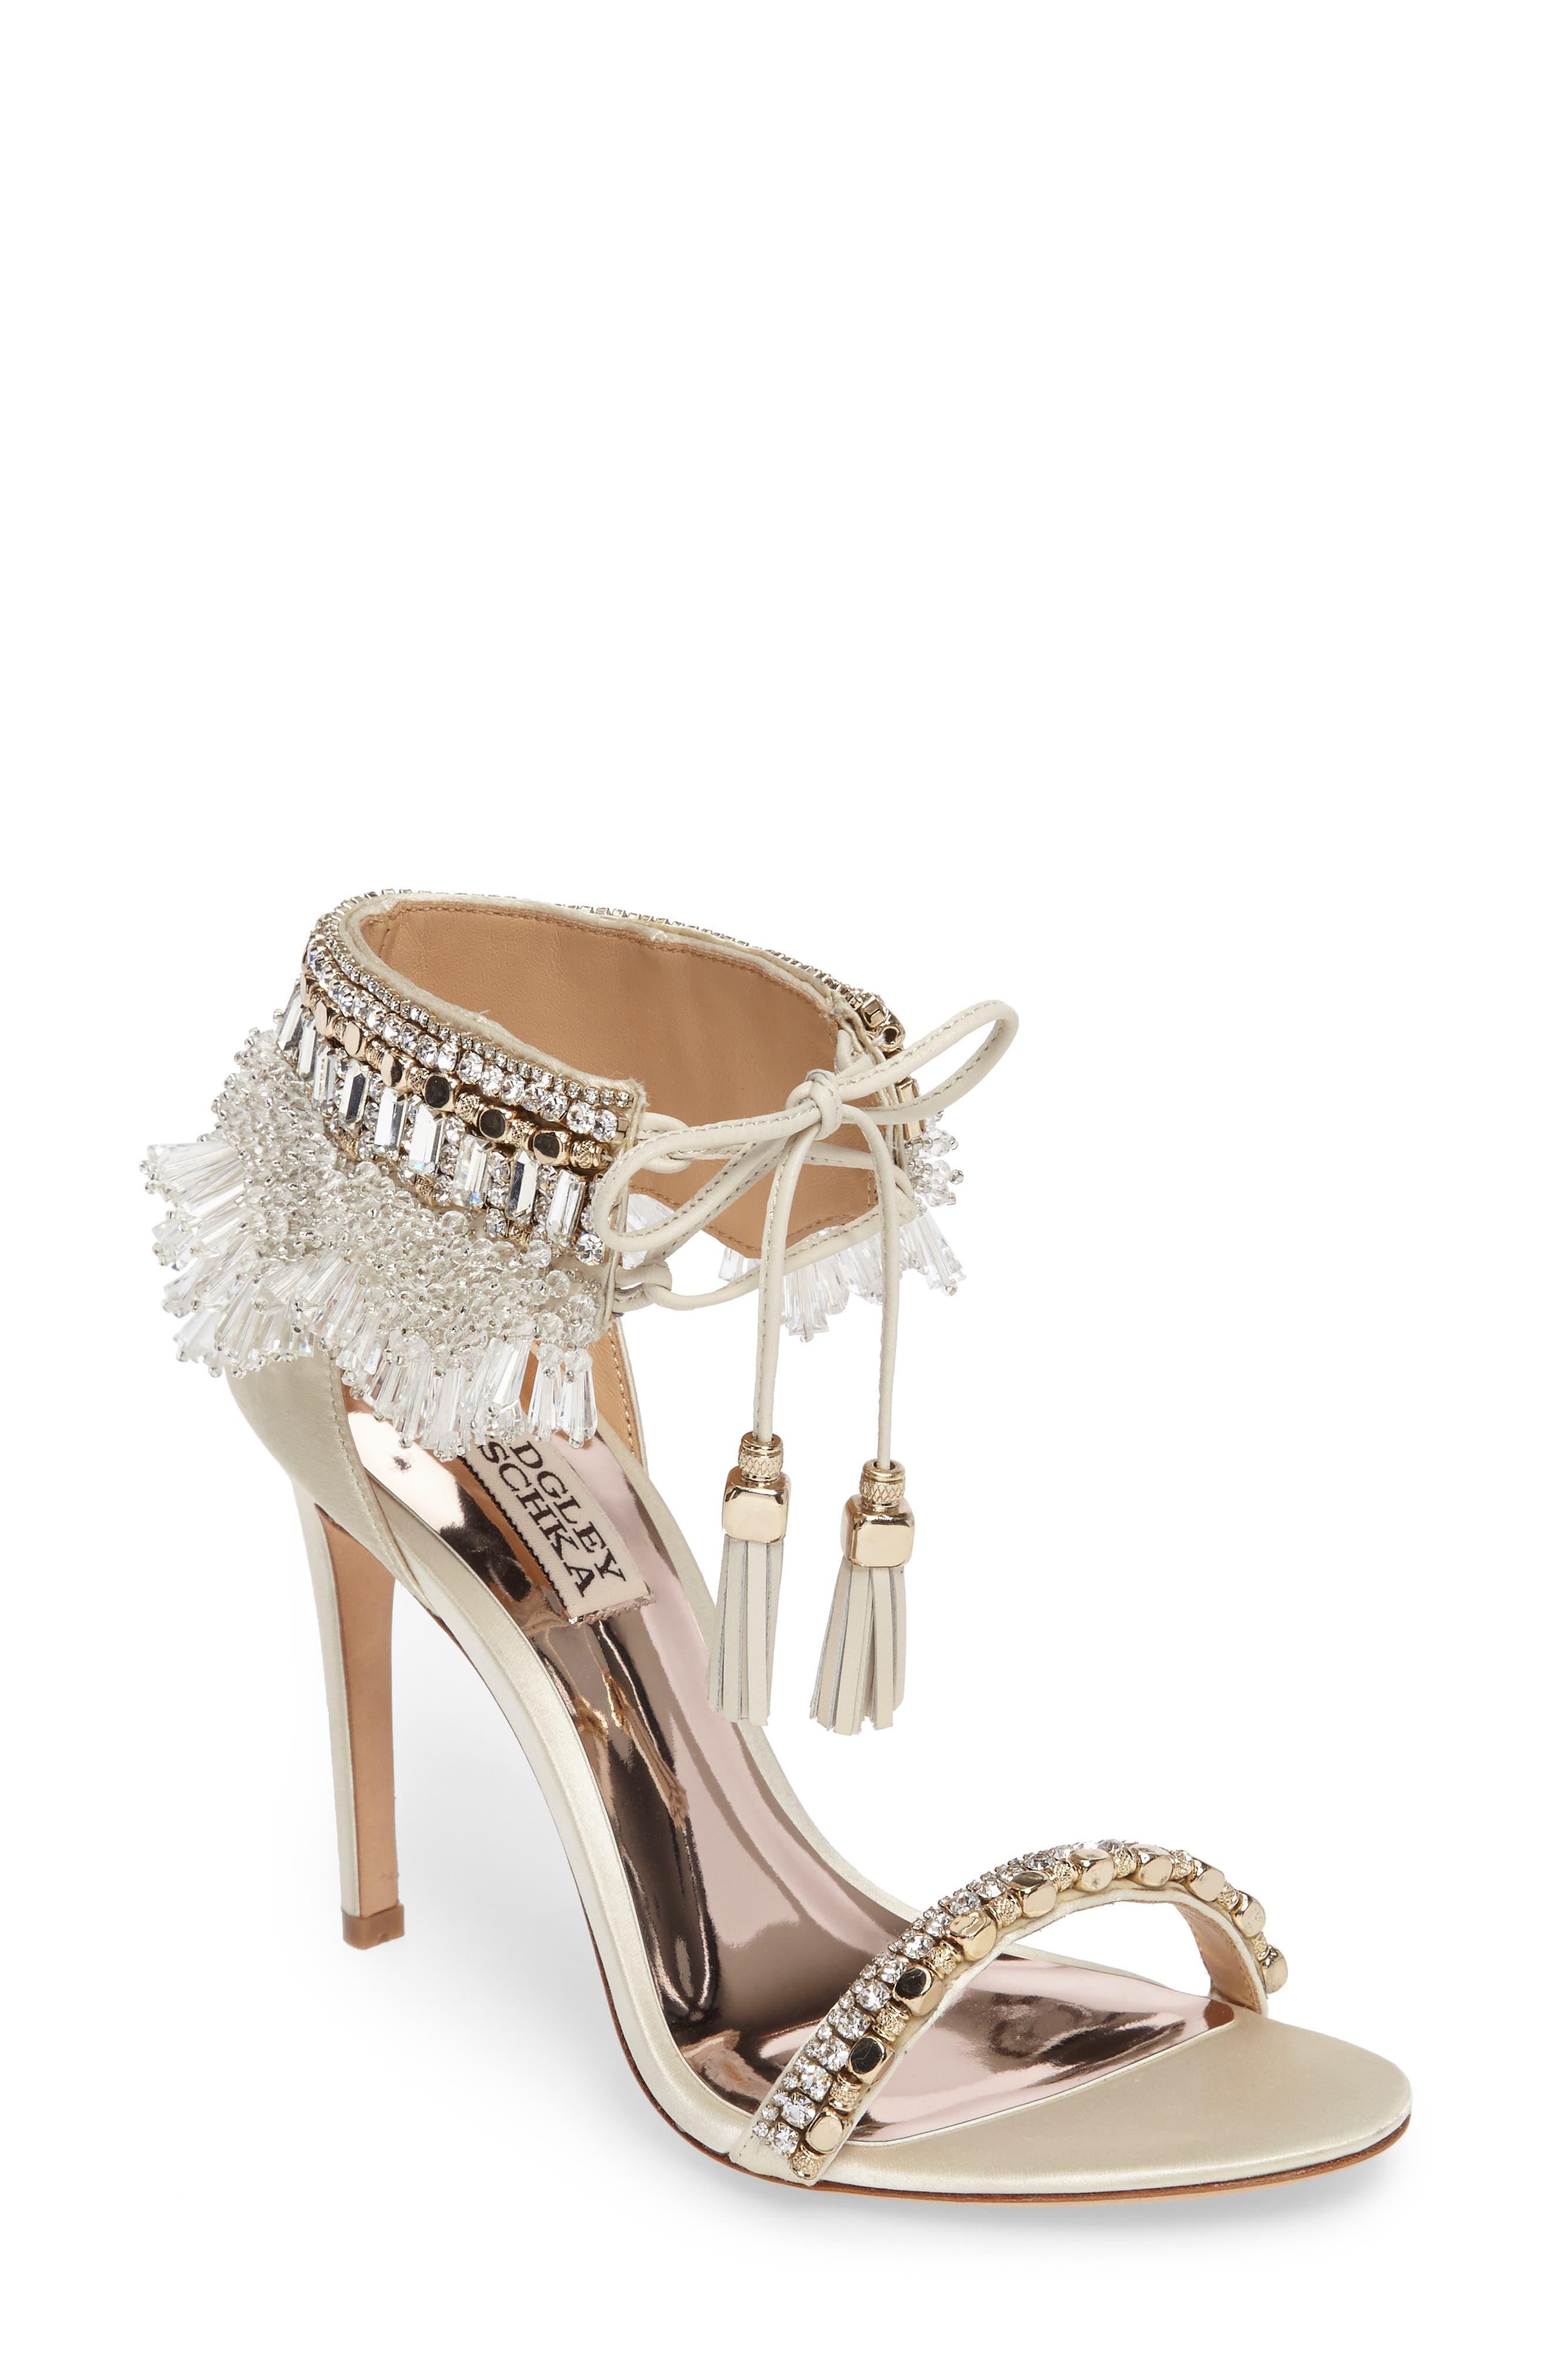 Main Image - Badgley Mischka Katrina Embellished Tie Sandal (Women)